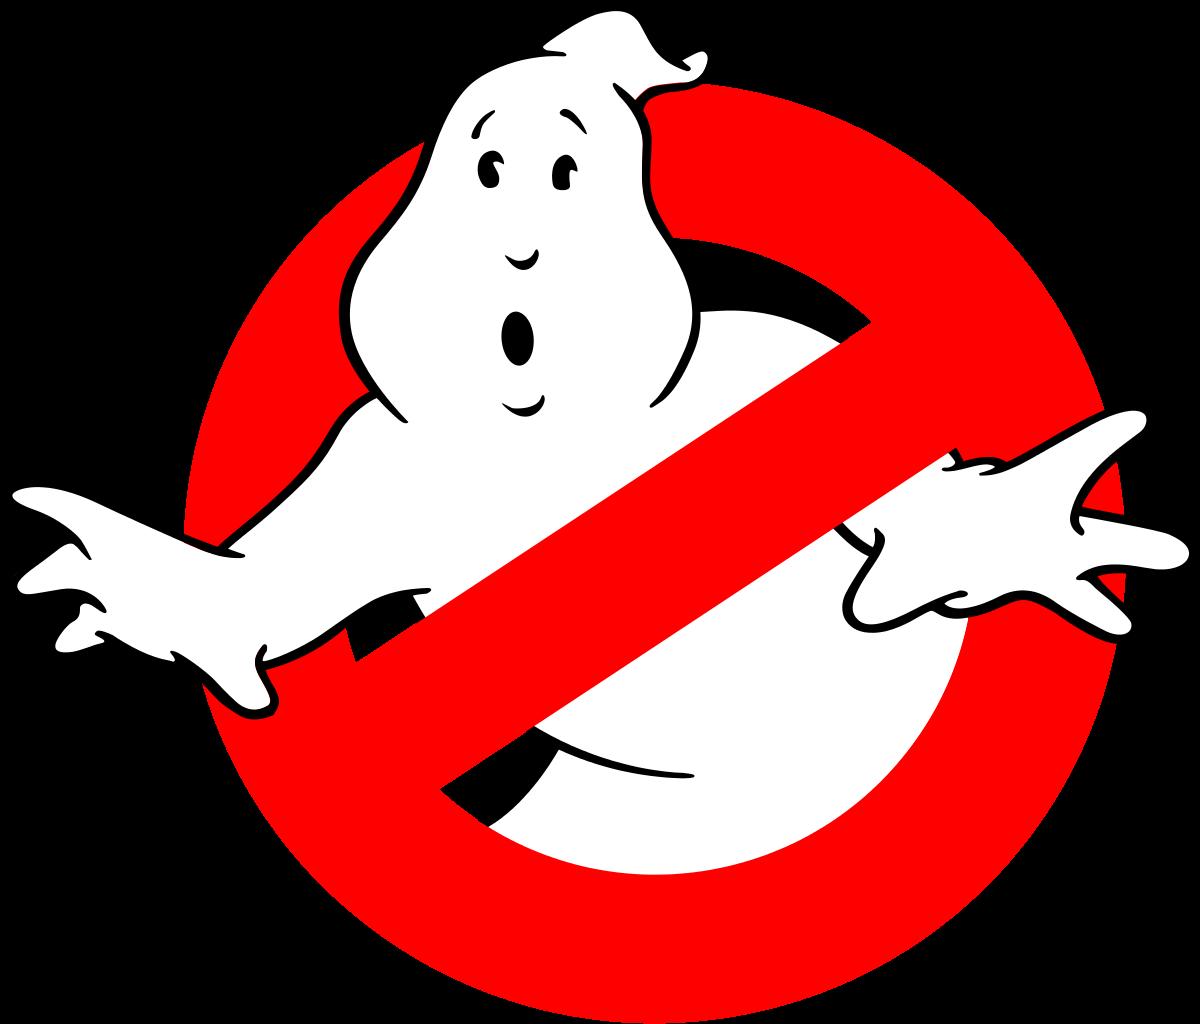 la play list ghost buster - La play list